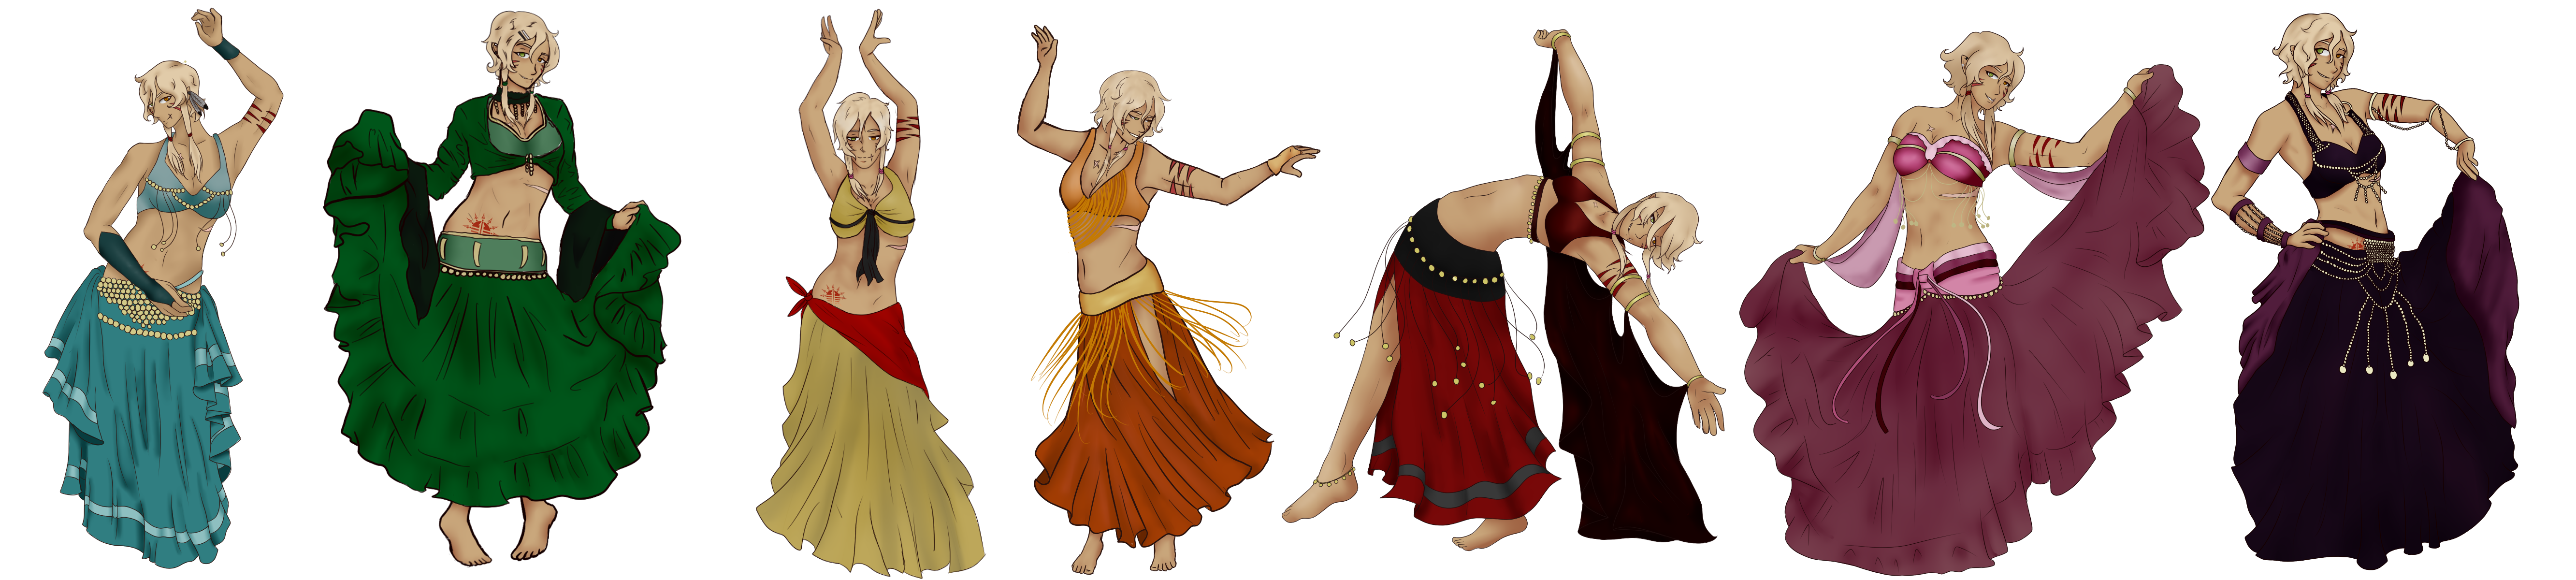 hgu__belly_dance_dresses_by_onlyairshipcapn d8t4tq7 hgu belly dance dresses by onlyairshipcapn on deviantart